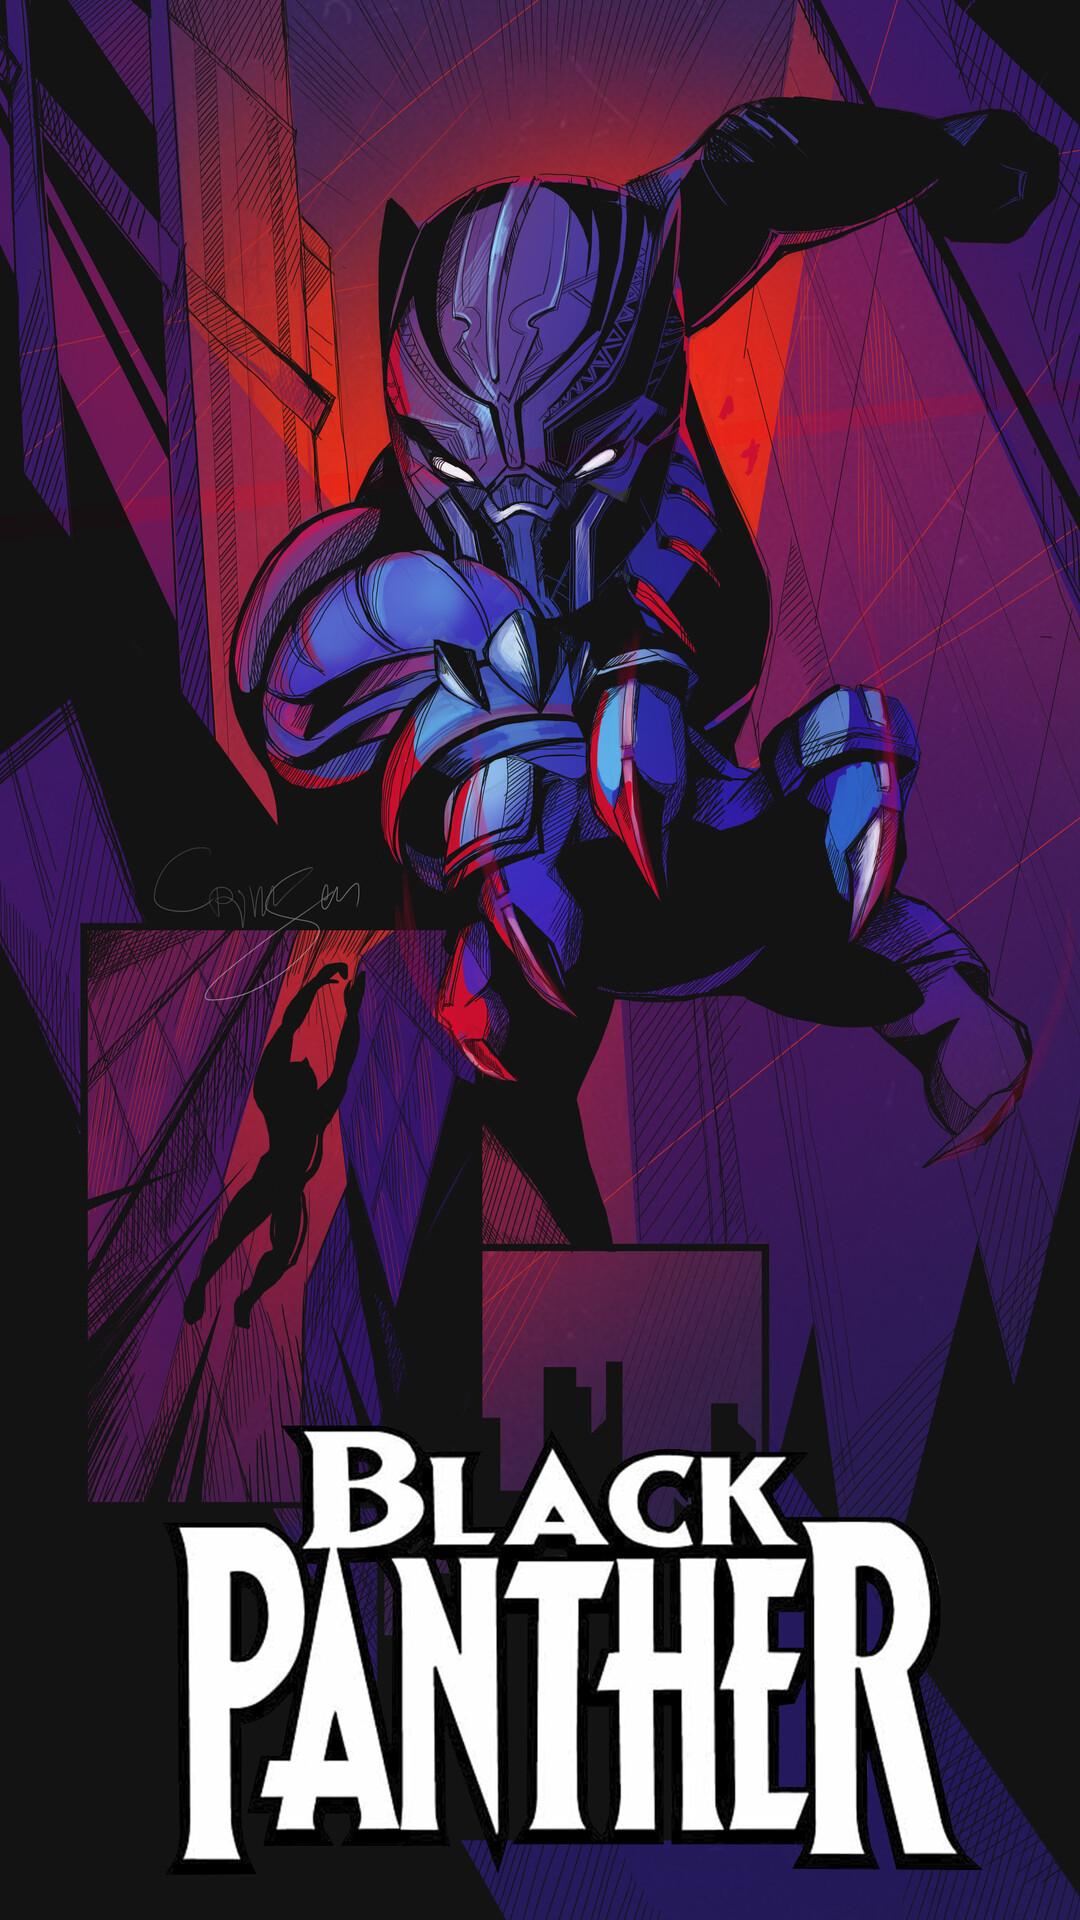 Marvel Comics Black Panther Wallpaper Oscargilaberte Com